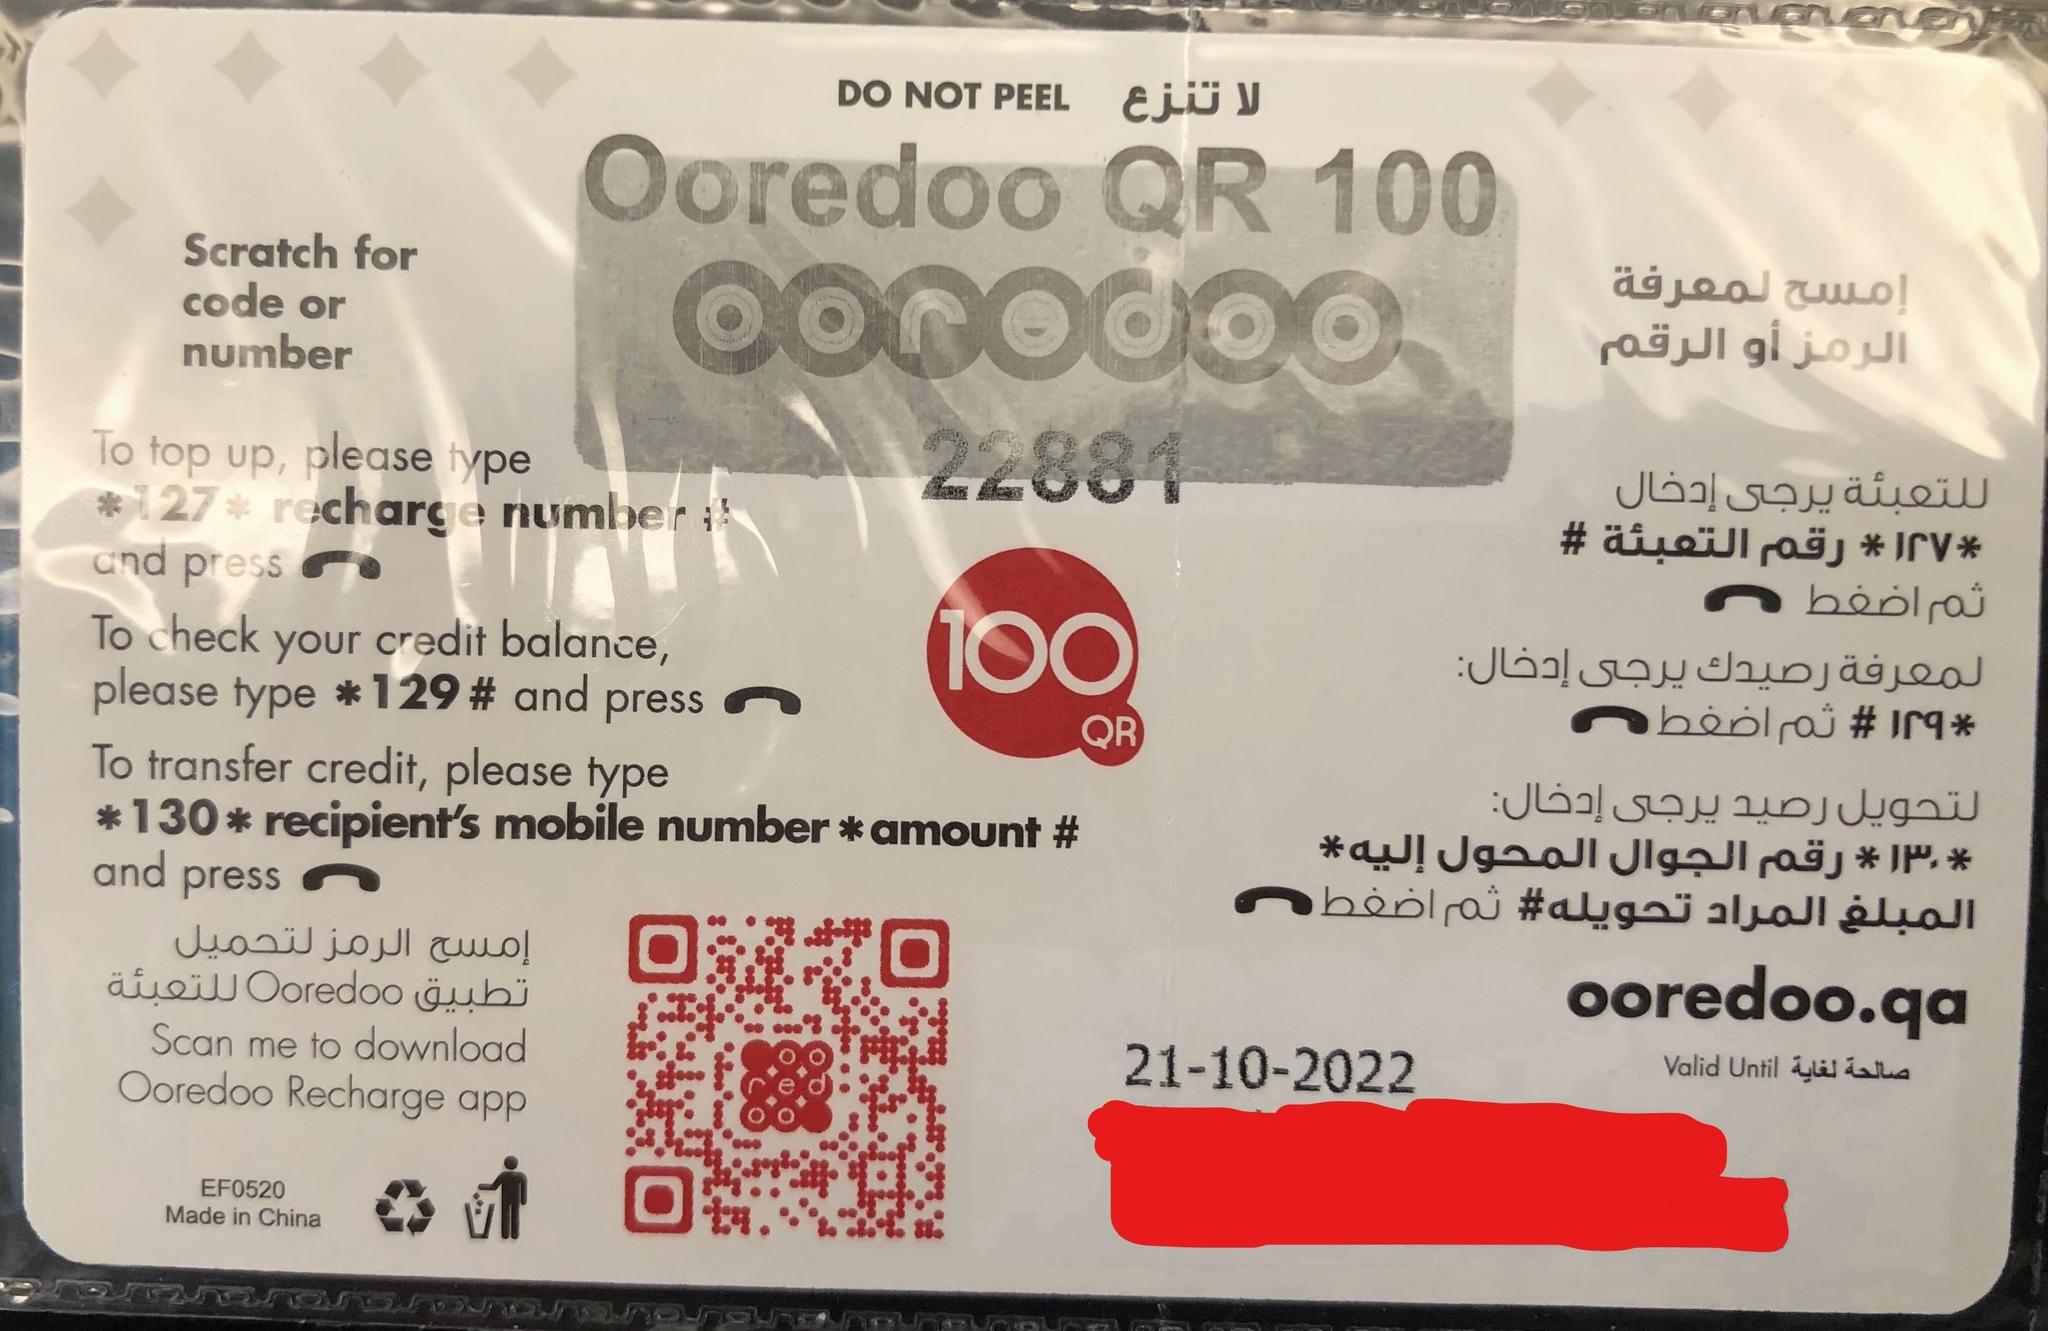 OOREDOO charge card sale